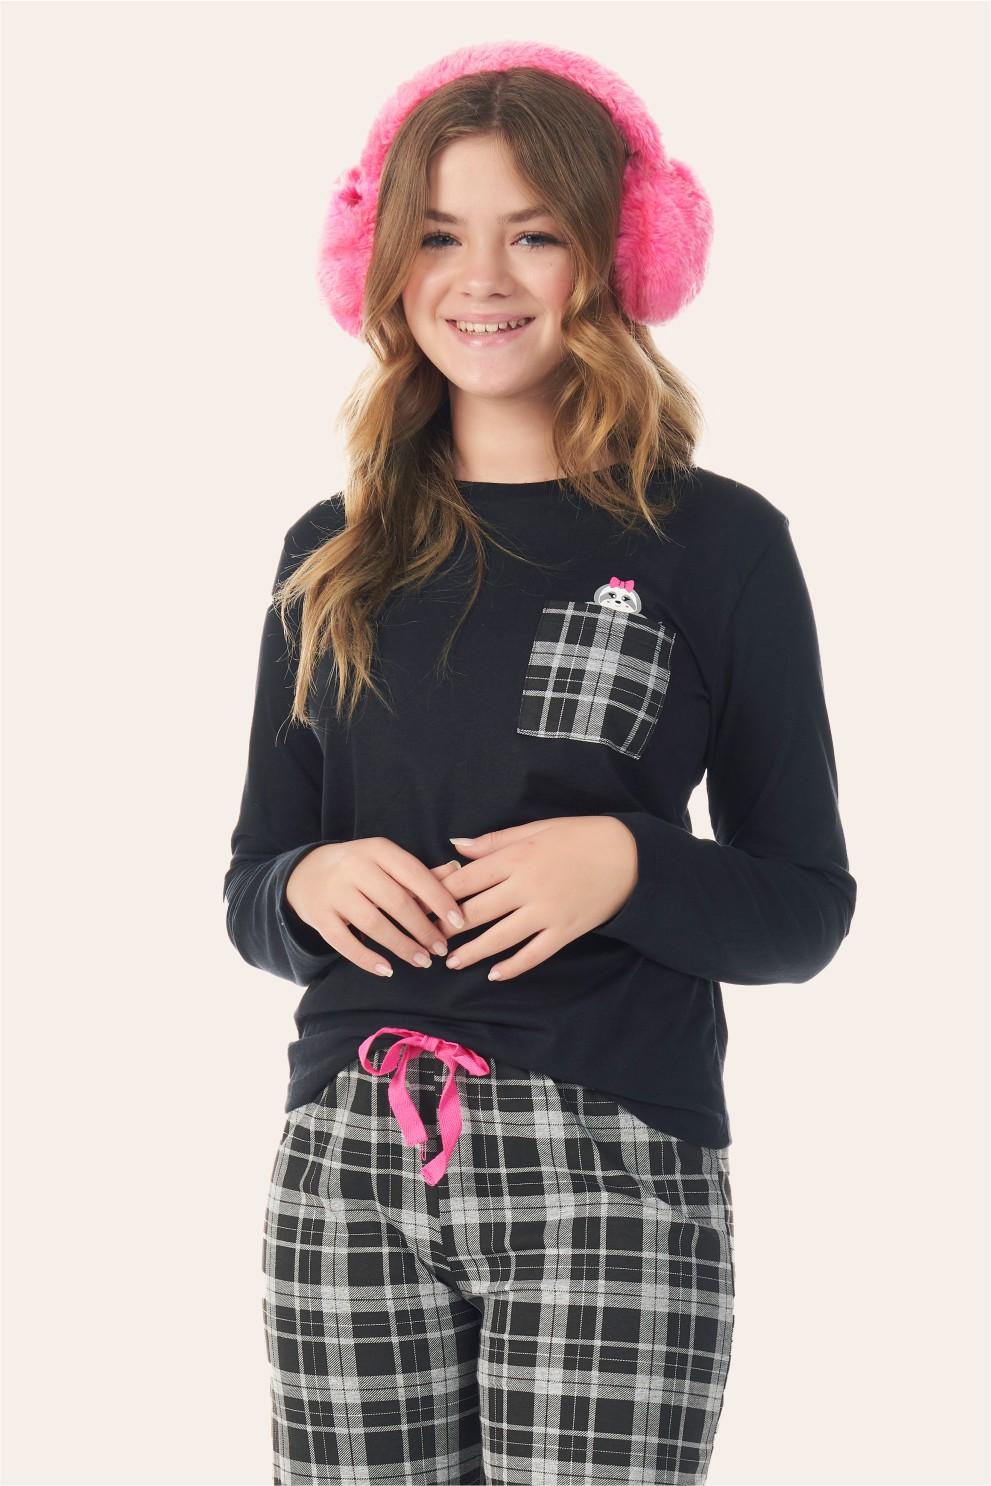 002/B - Pijama Juvenil Feminino Xadrez Preto